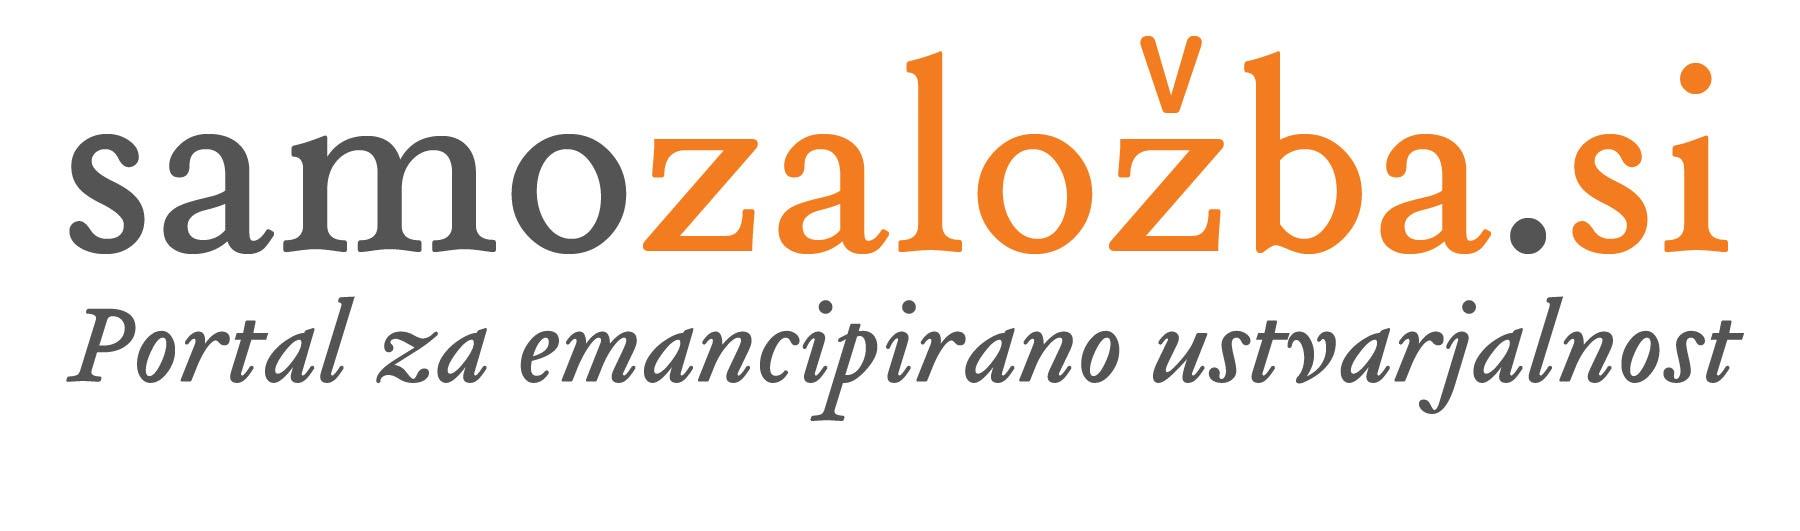 Samozaložba.si | Portal za emancipirano ustvarjalnost